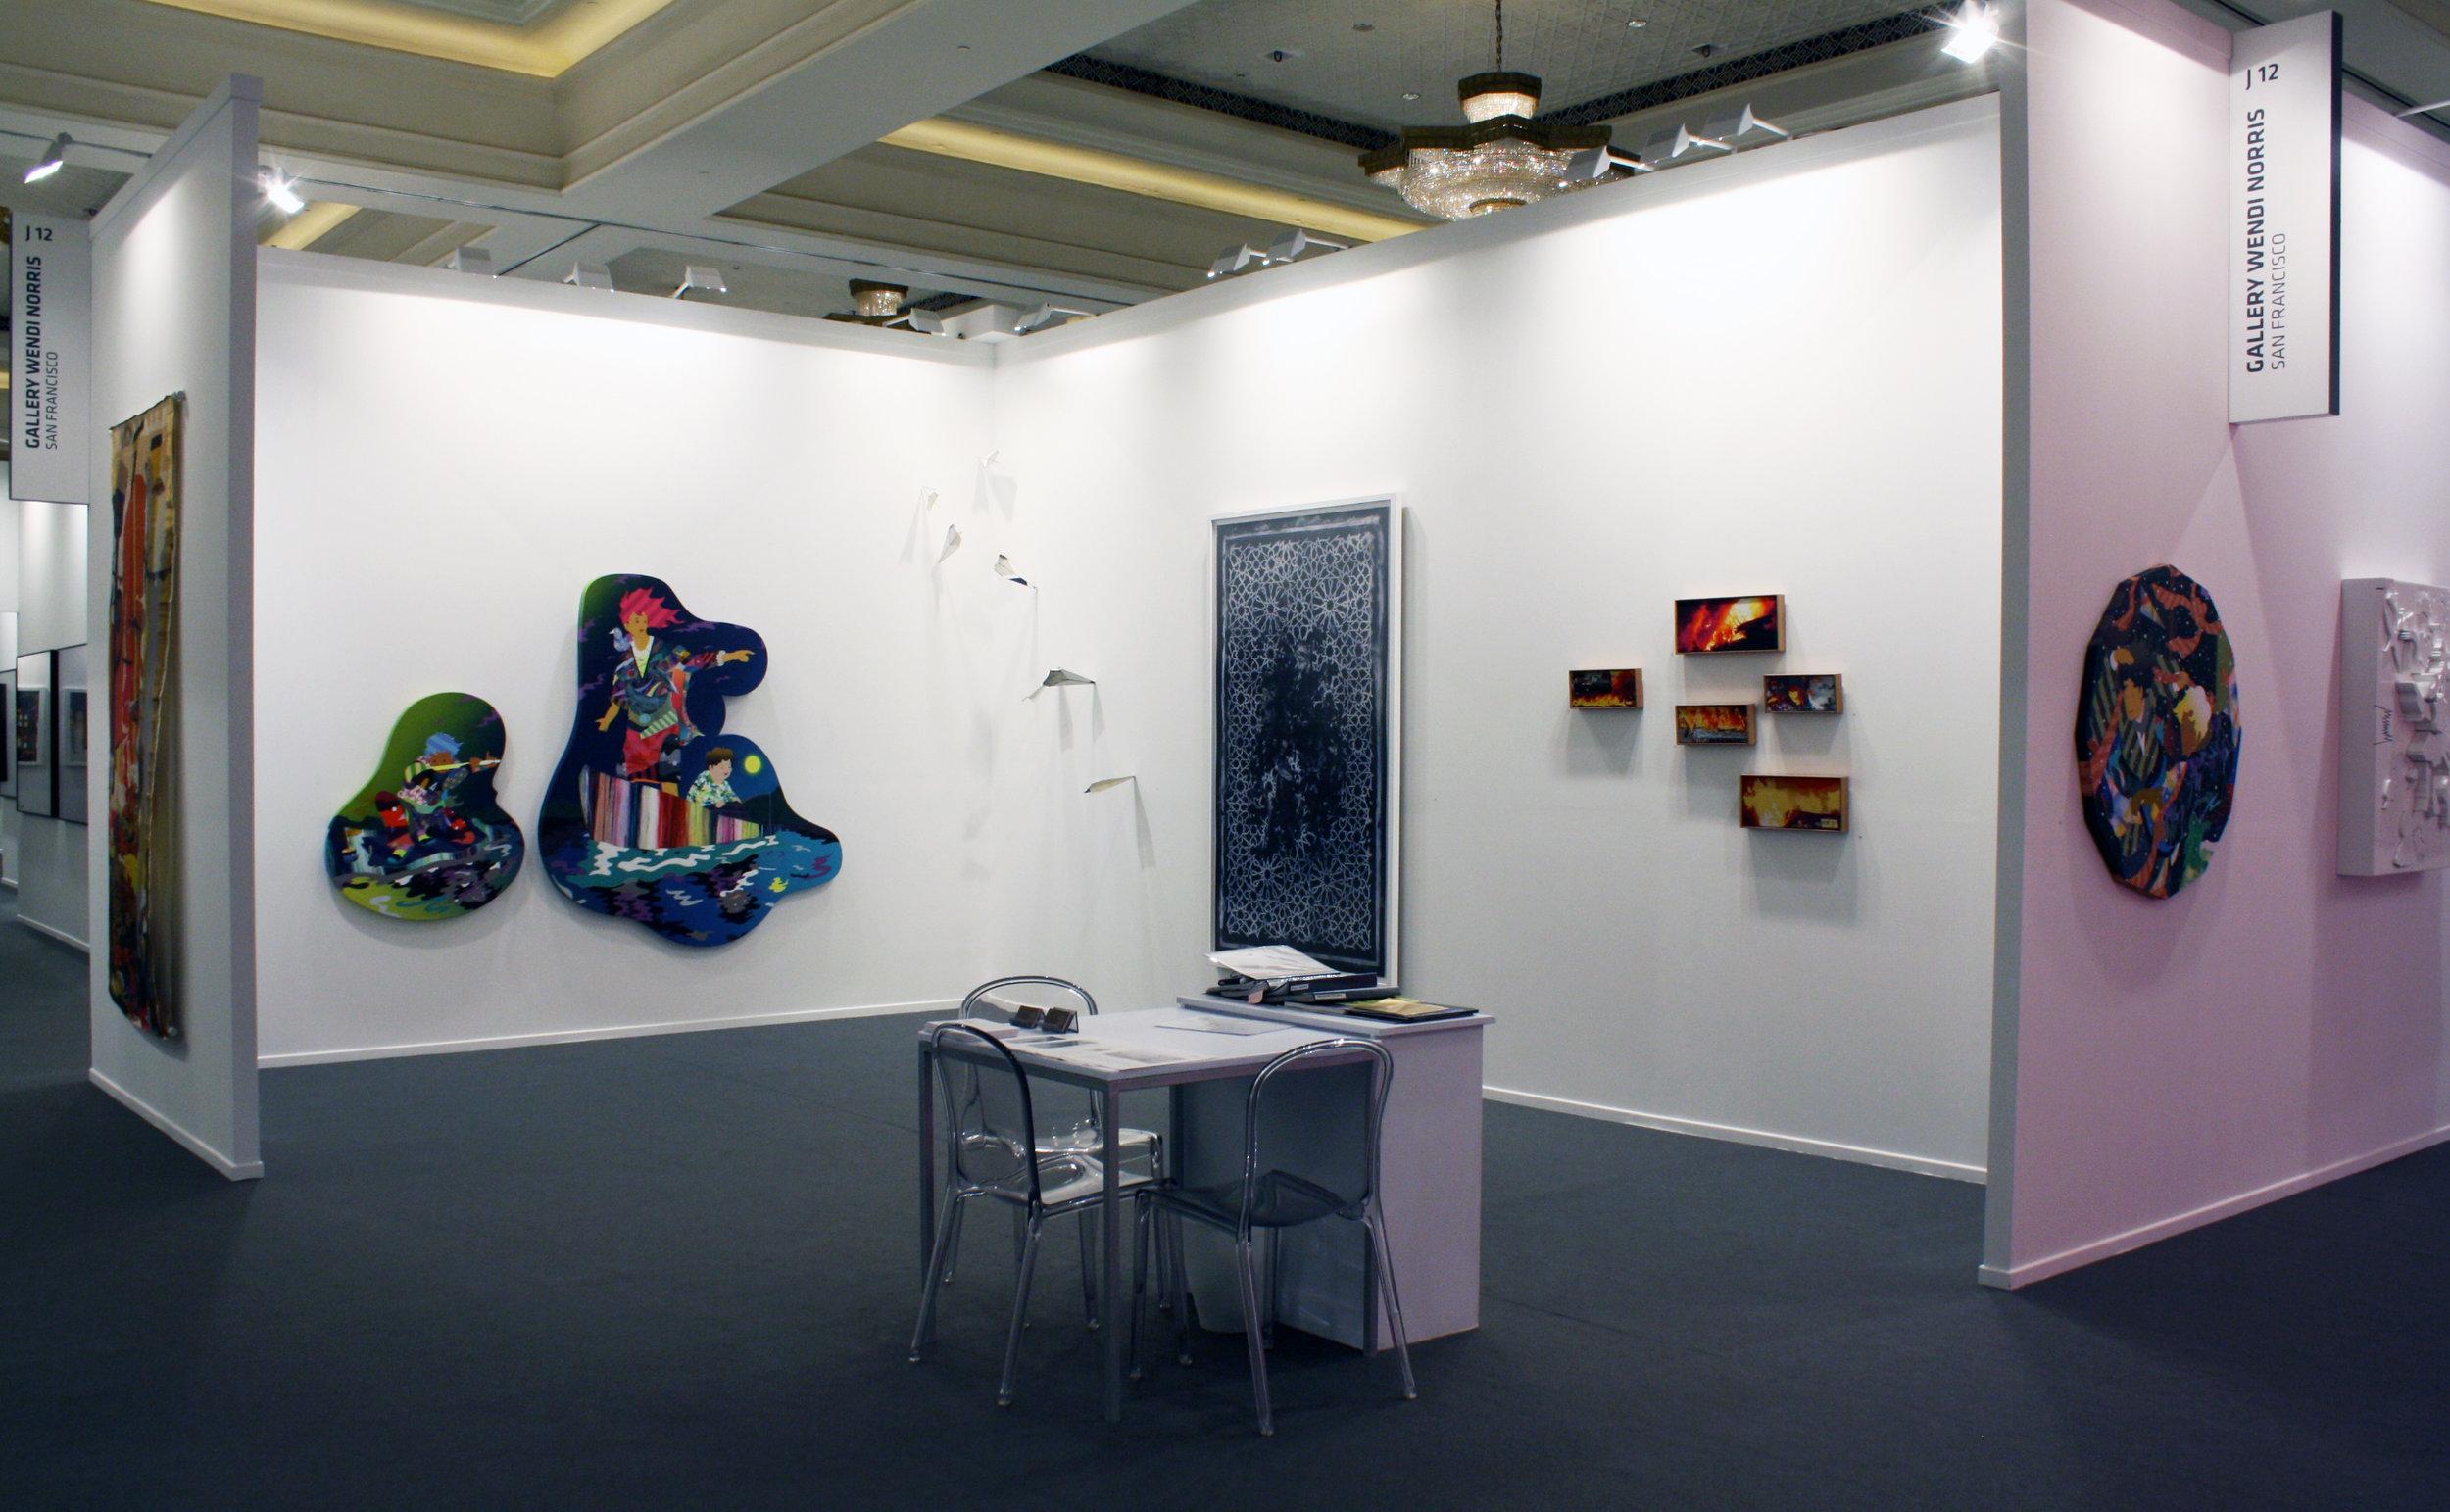 Art Dubai 2013,  Madinat Jumeirah, Dubai, United Arab Emirates, Booth J12, March 20 – March 23, 2013